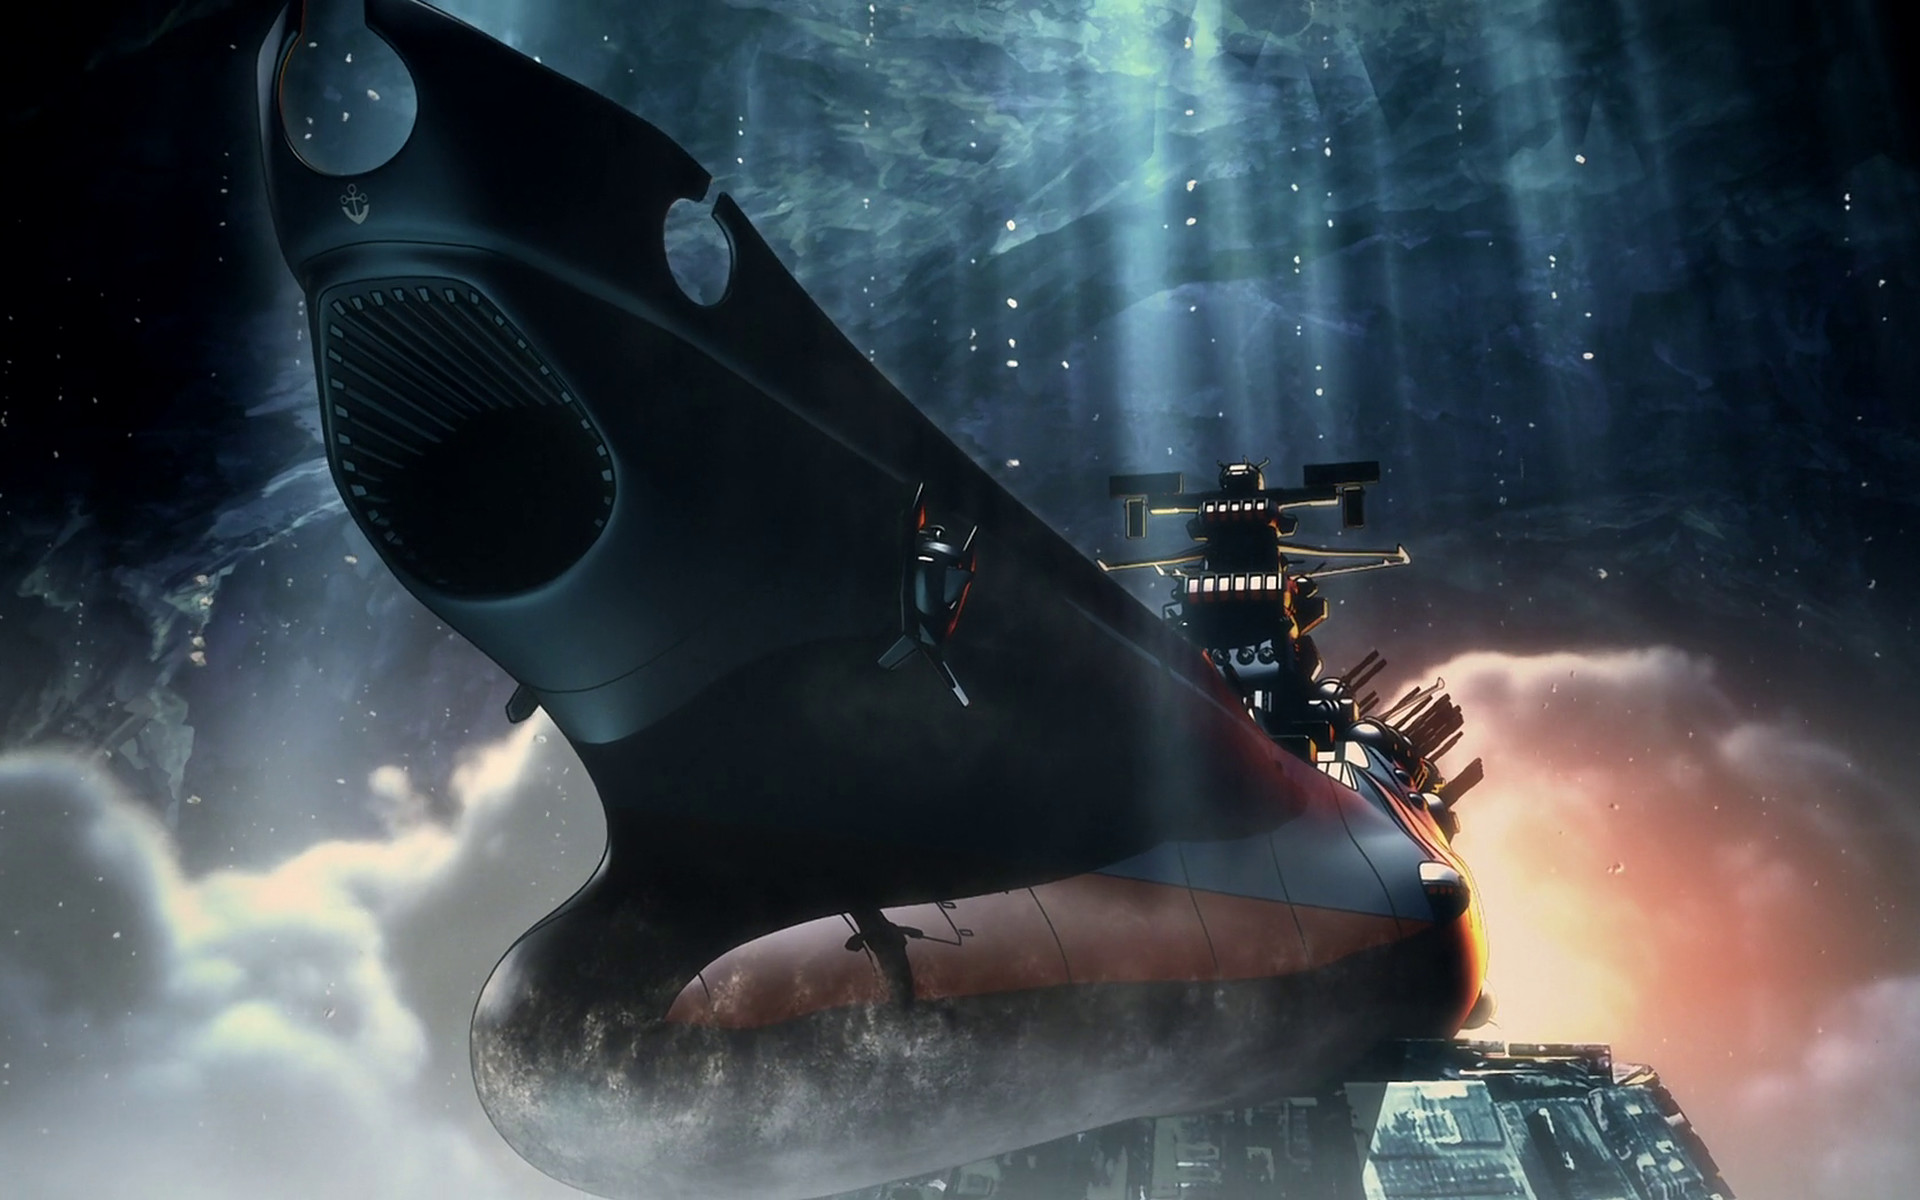 Space Battleship Yamato 2199 Wallpaper (86+ images)